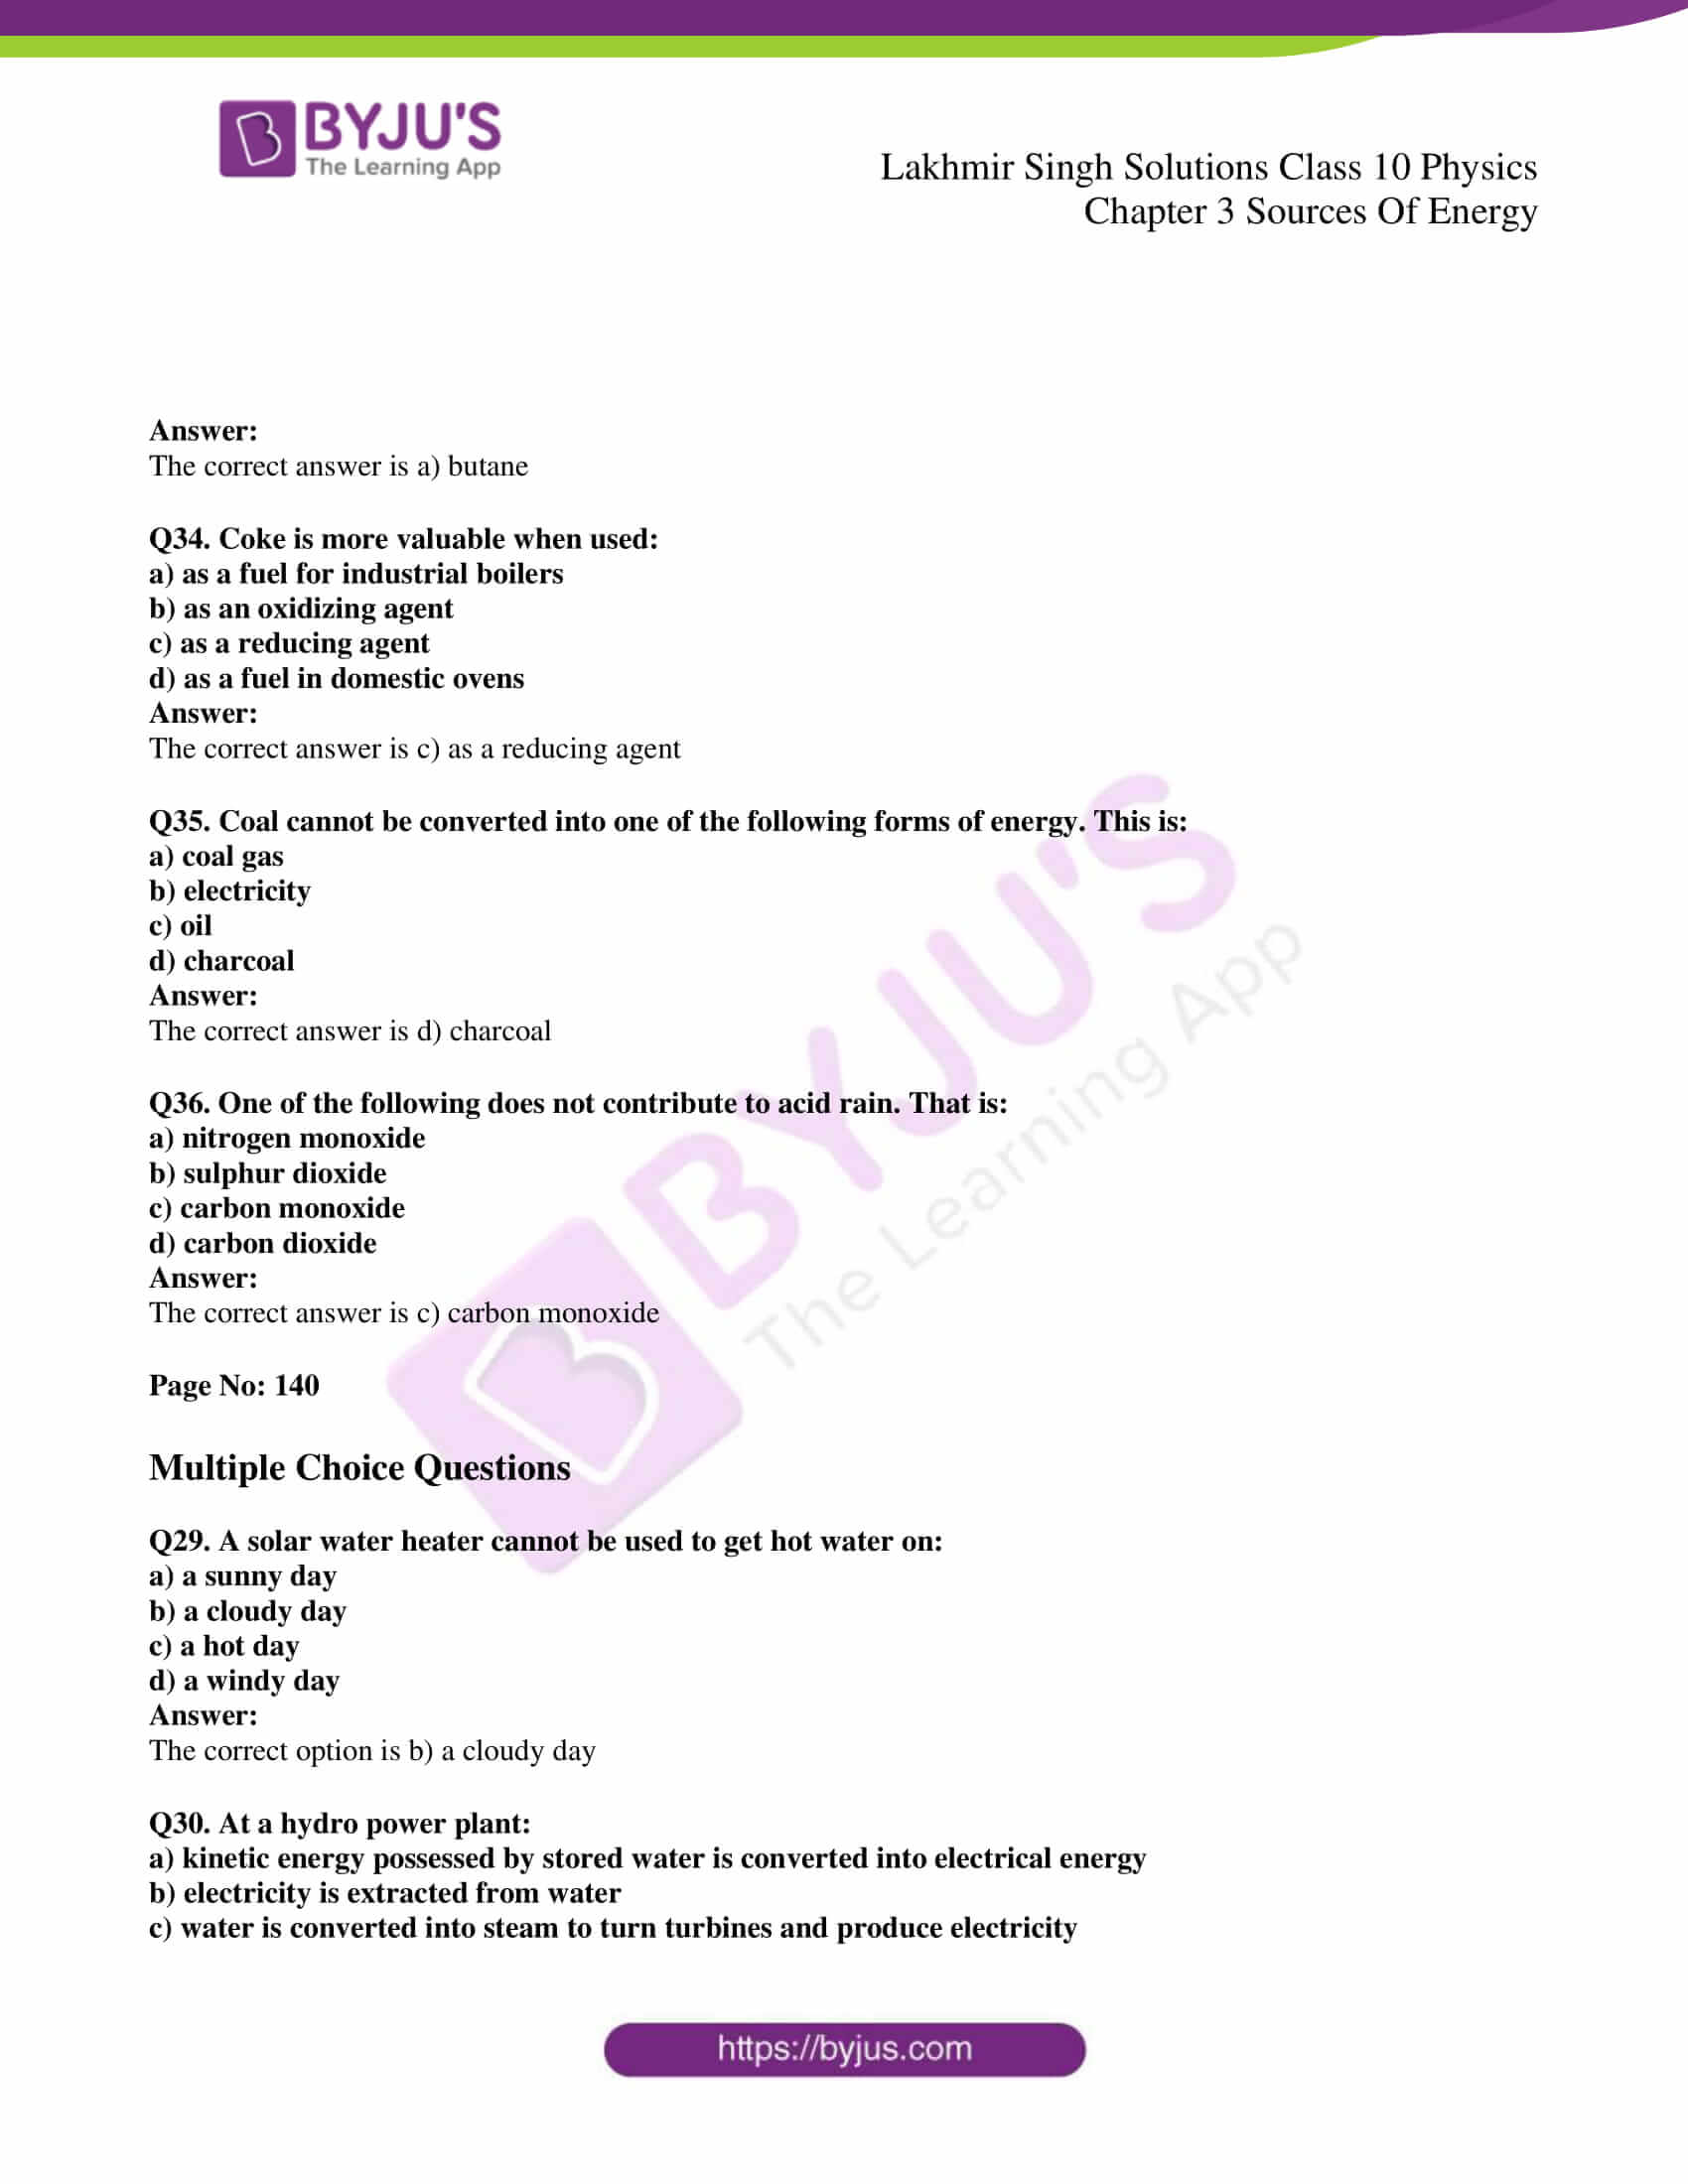 lakhmir singh sol class 10 physics chapter 3 12